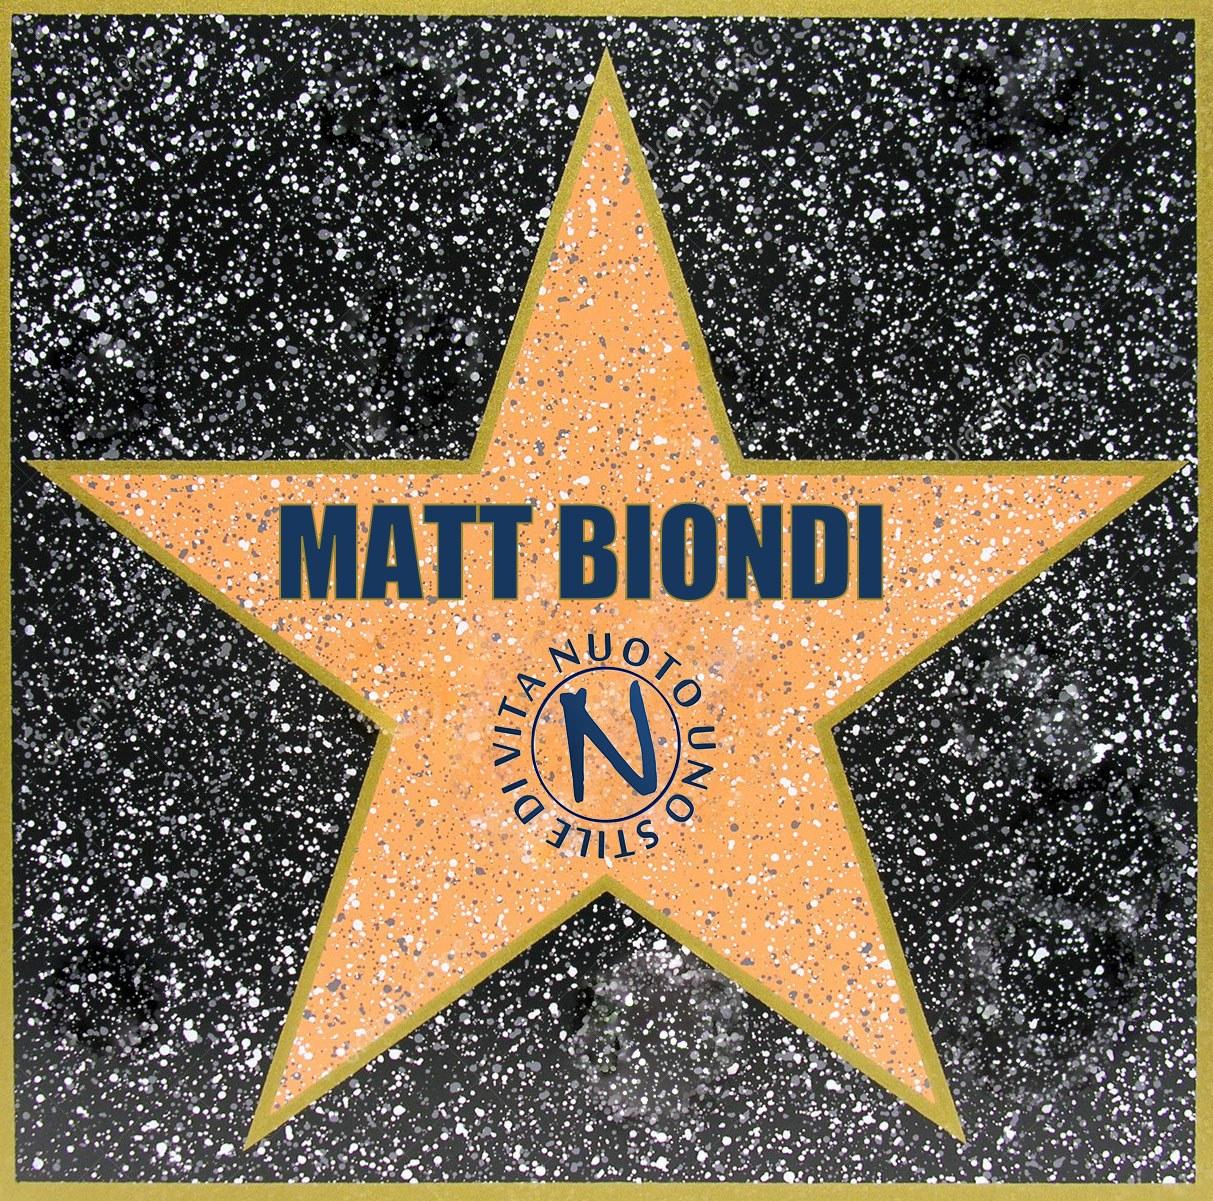 hall-of-fame-biondi